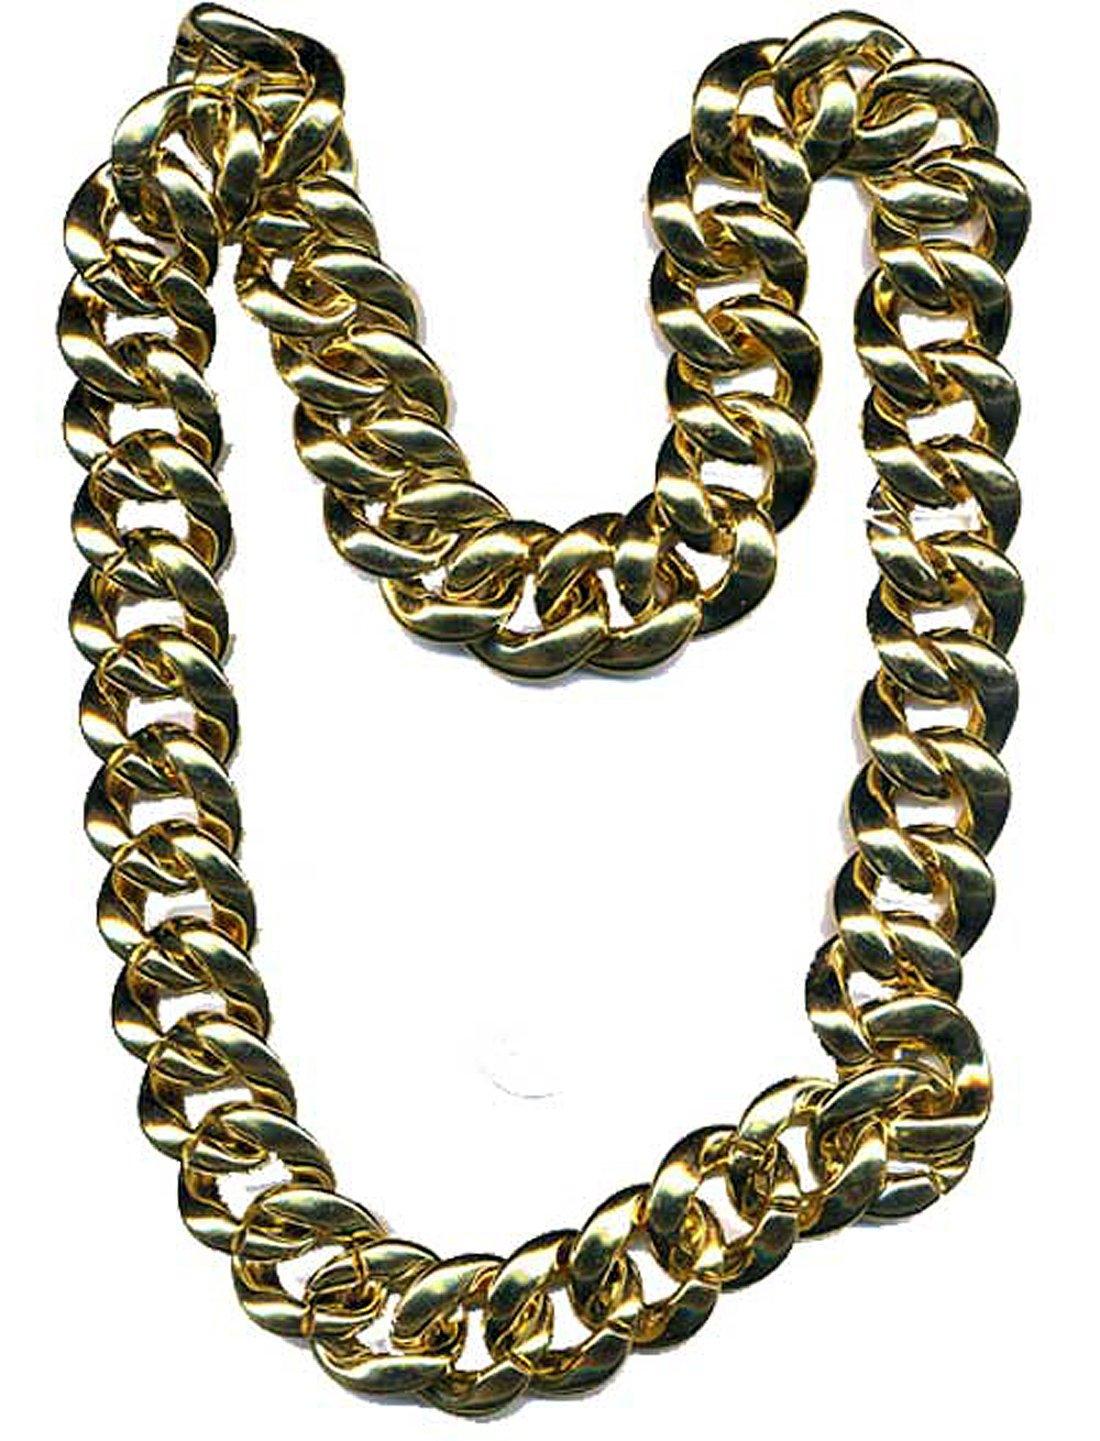 npchn (Gold) Pimp Necklace Rapper Bling 36''